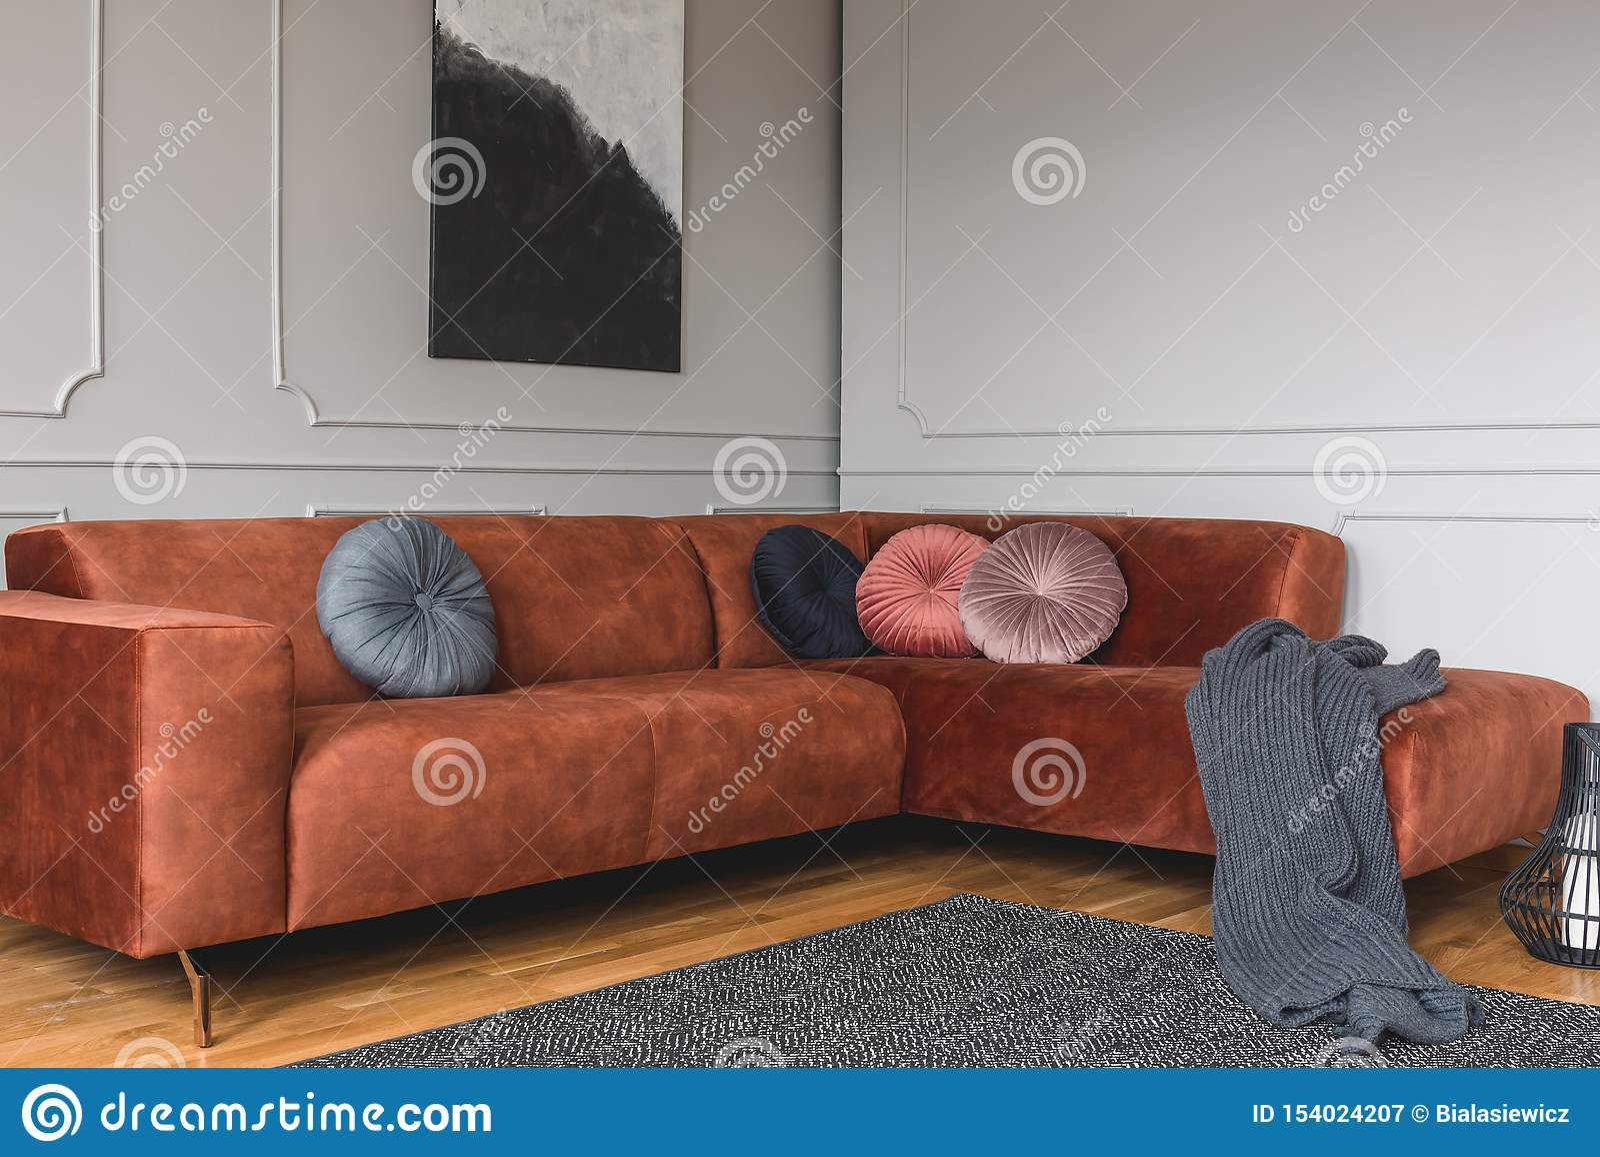 Grey, Black, Beige And Pink Round Velvet Pillows On Ginger ...